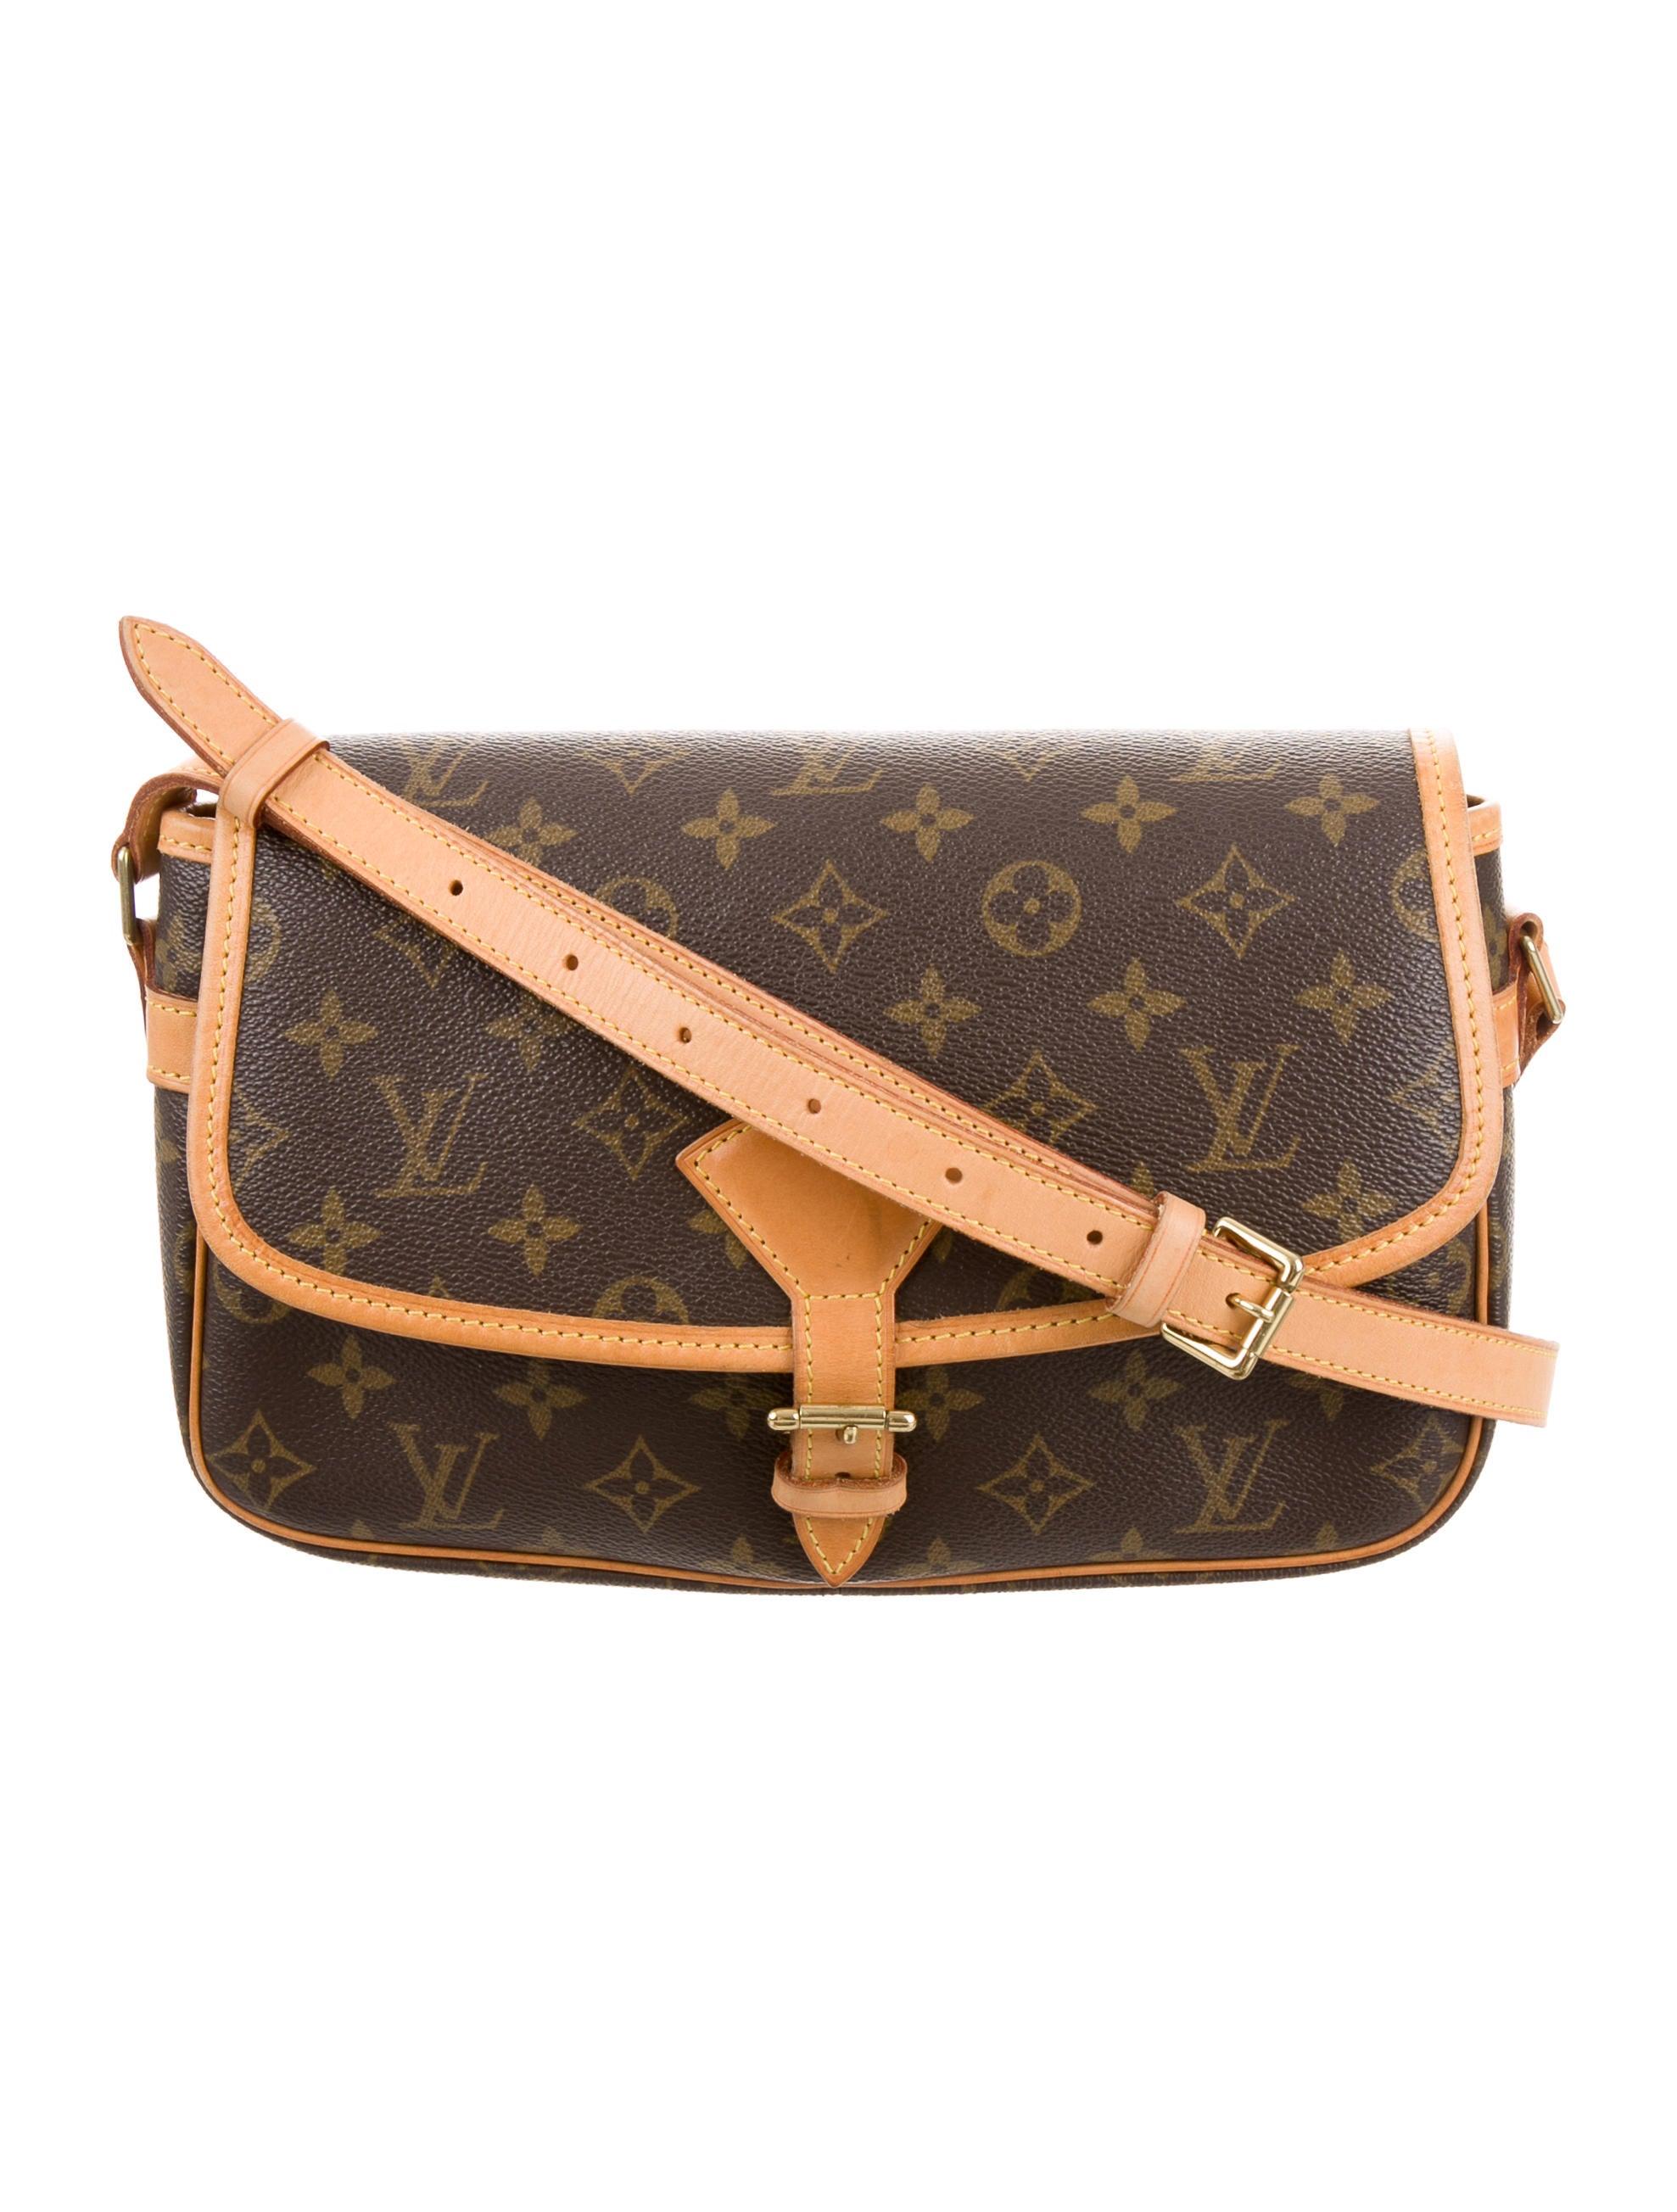 b85628b71daa1 Louis Vuitton Monogram Sologne Crossbody - Handbags - LOU100494 ...